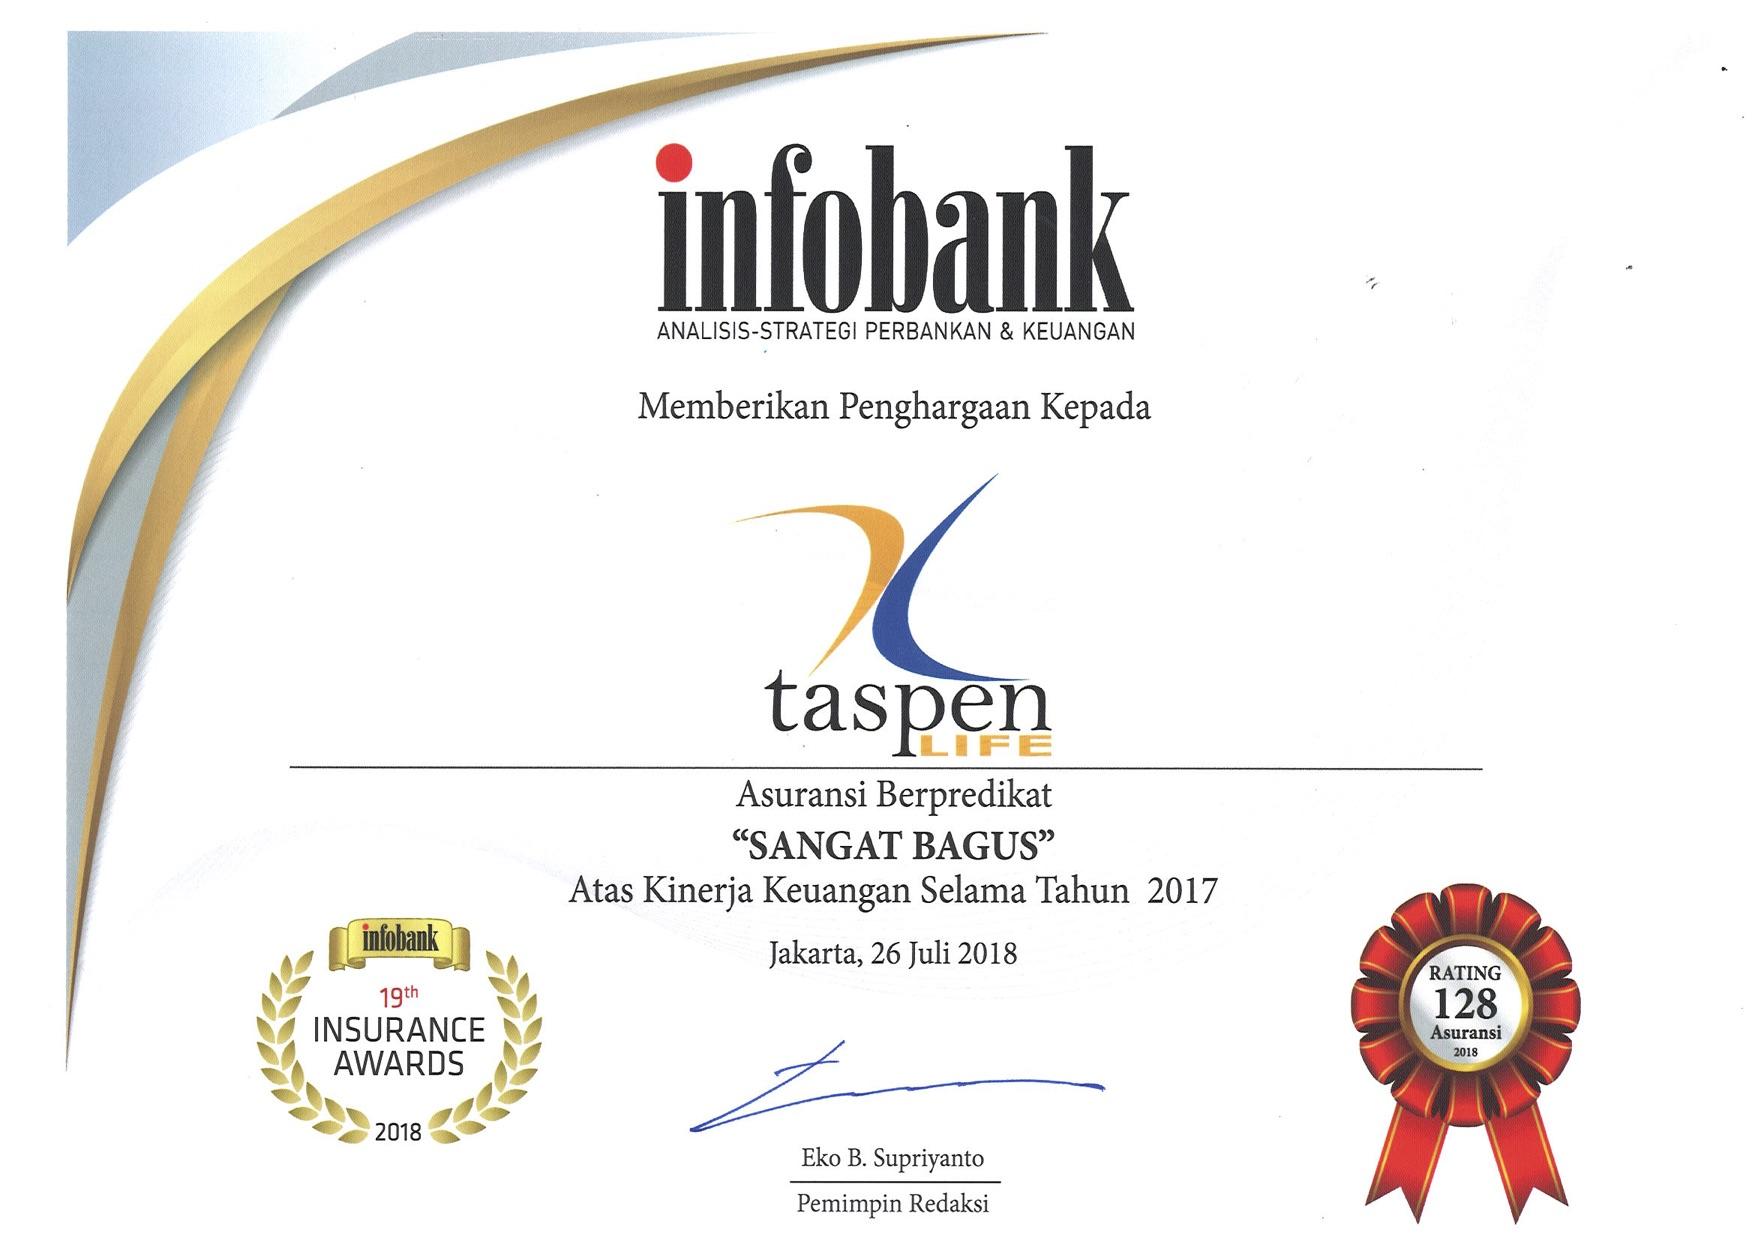 Infobank Insurance Award 2018